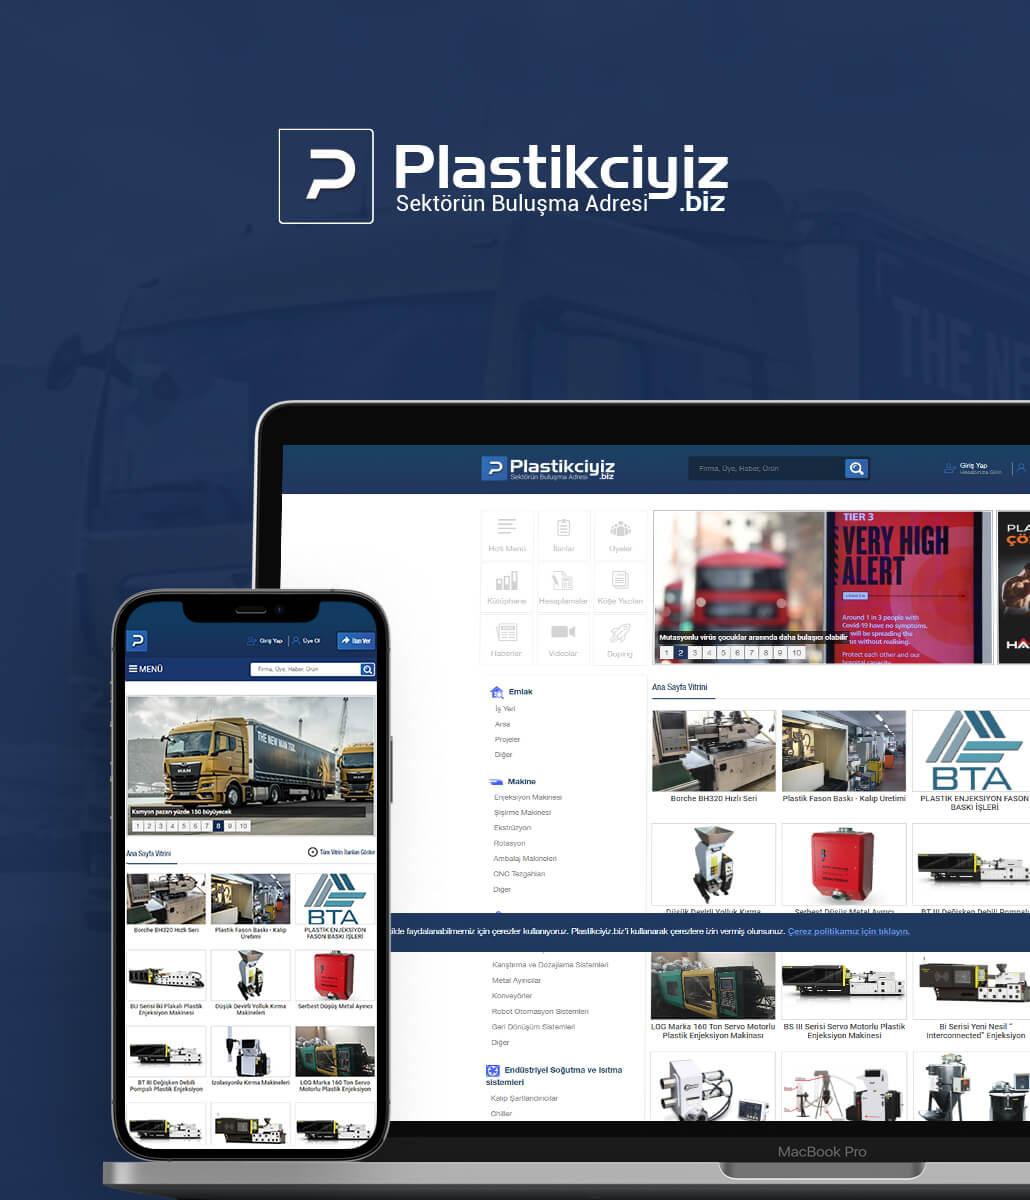 Plastikciyiz.biz Sektörel Portal Sitesi